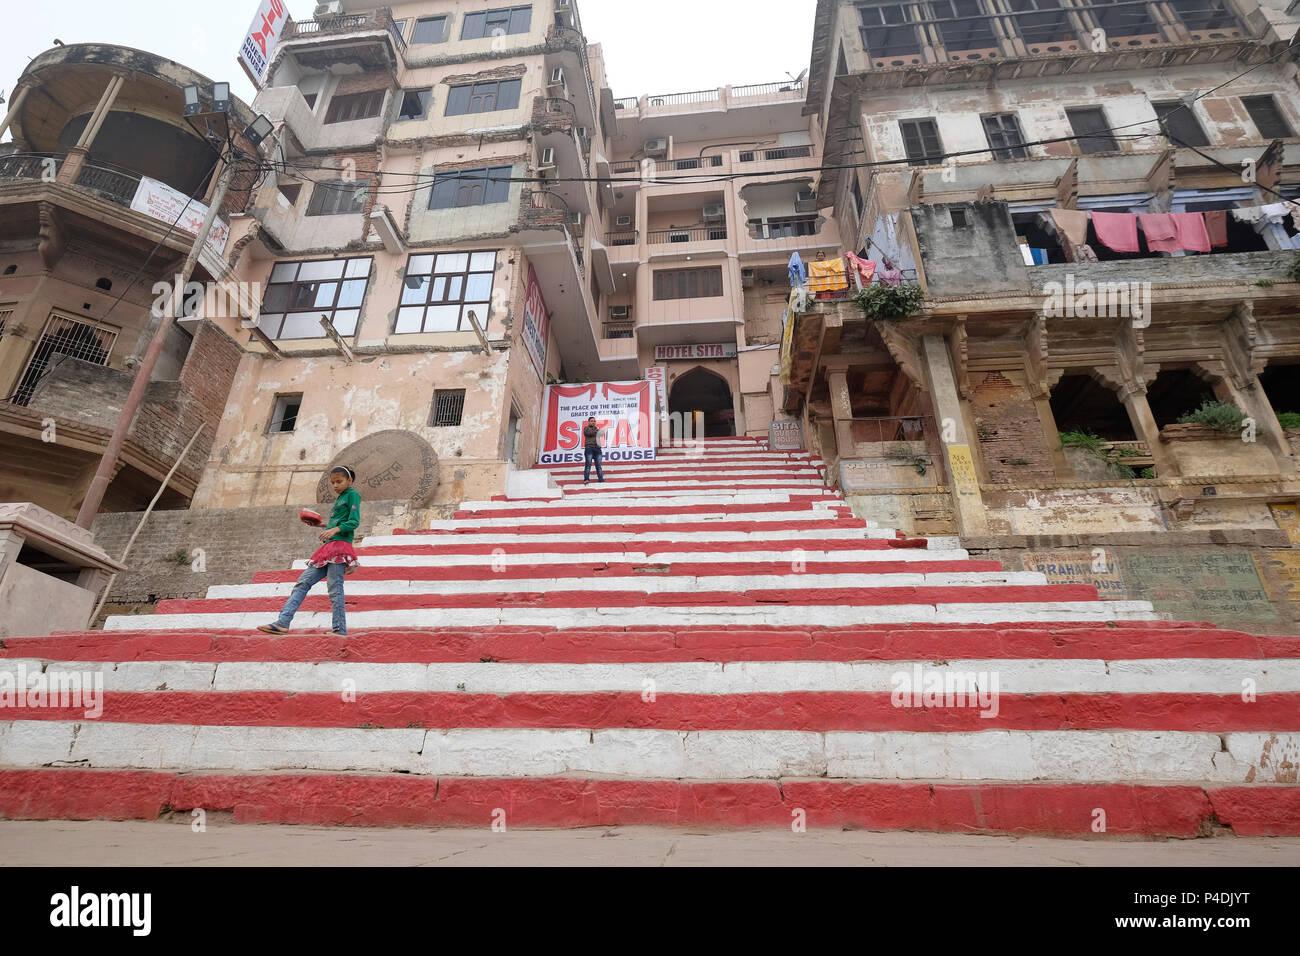 9c368d2ced61c2 India, Varanasi, daily life Stock Photo  209283308 - Alamy